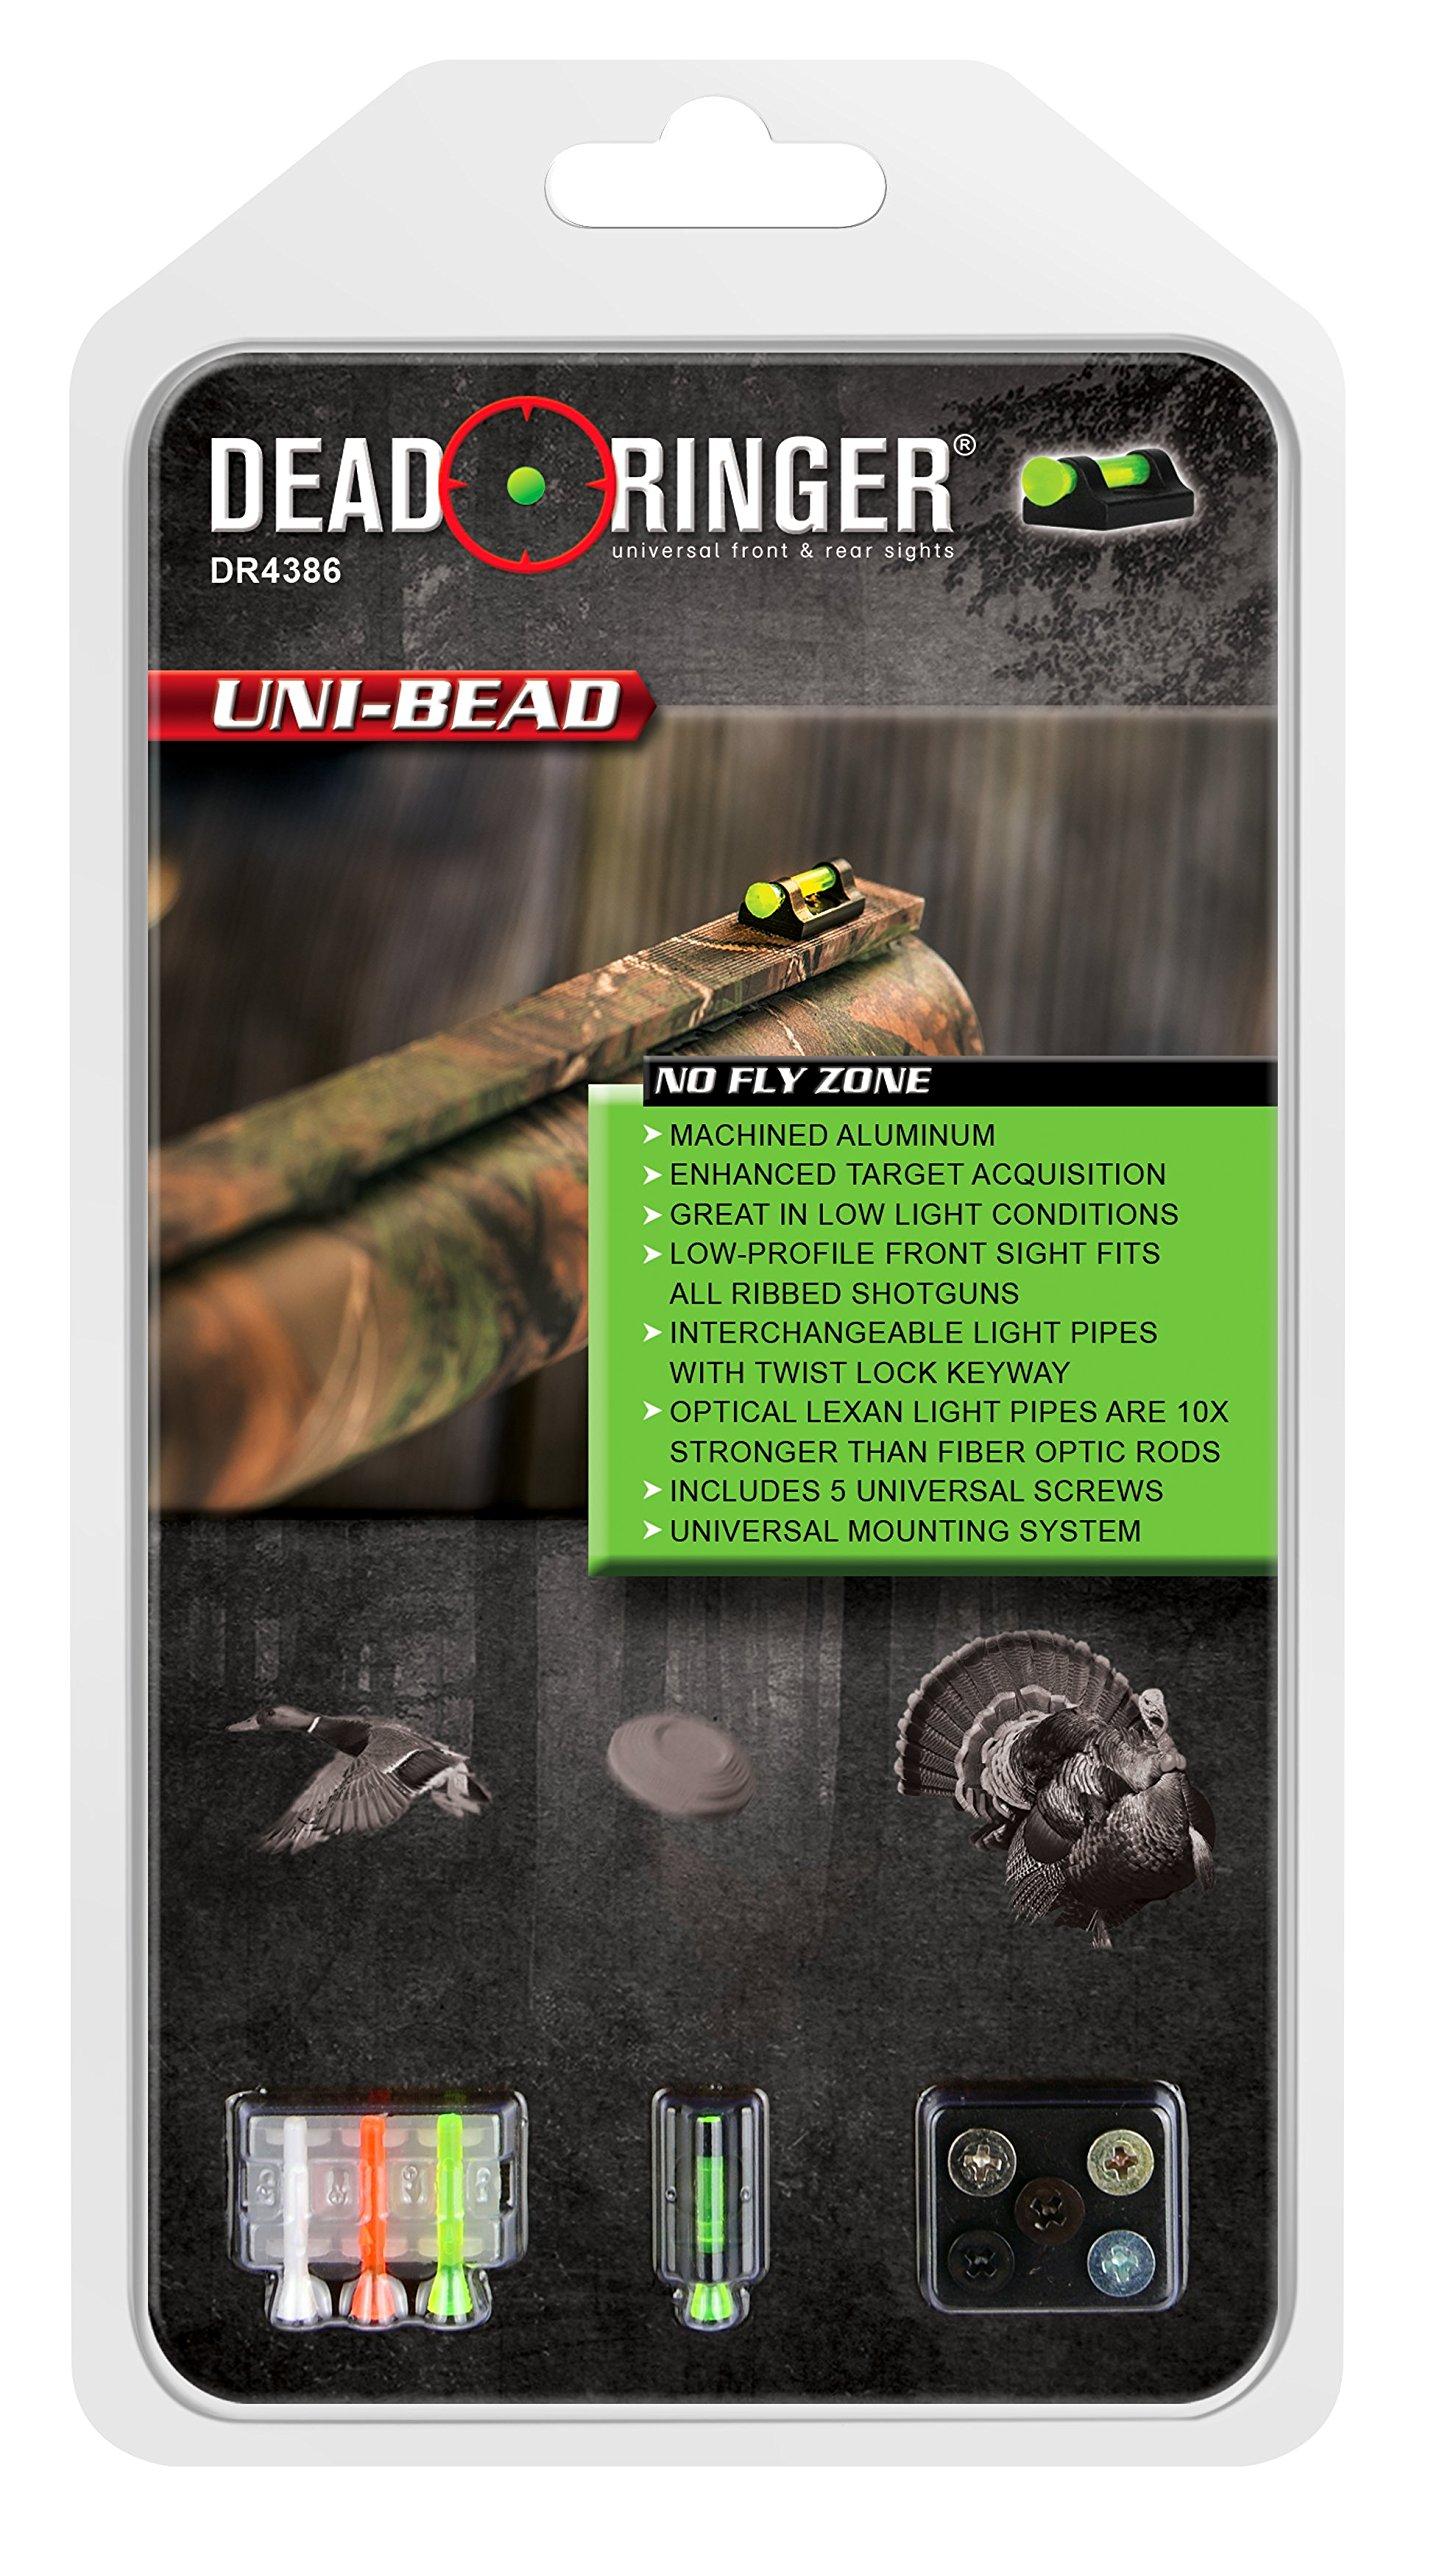 Dead Ringer Uni Bead Shotgun Profile